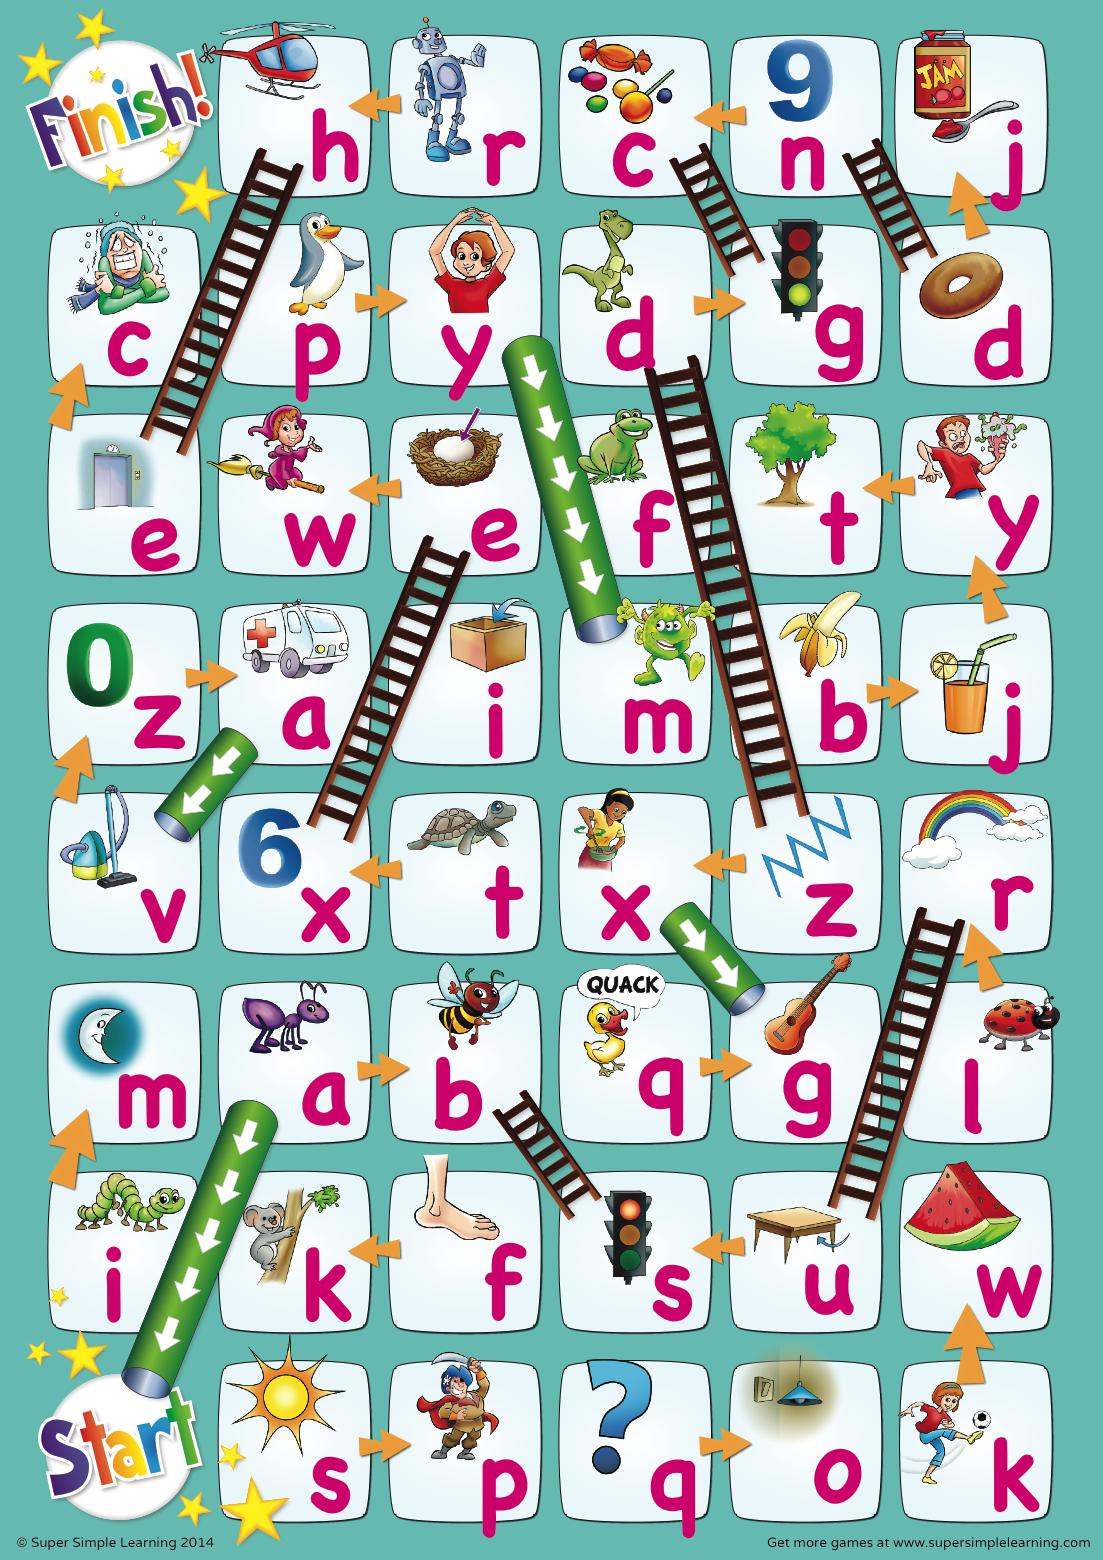 Macintosh HD:Users:kseniaevglevskaya:Documents:англ дети:фонет пра чиен слова буквы:алфавит:lowercase-alphabet-chutes-and-ladders-game.pdf